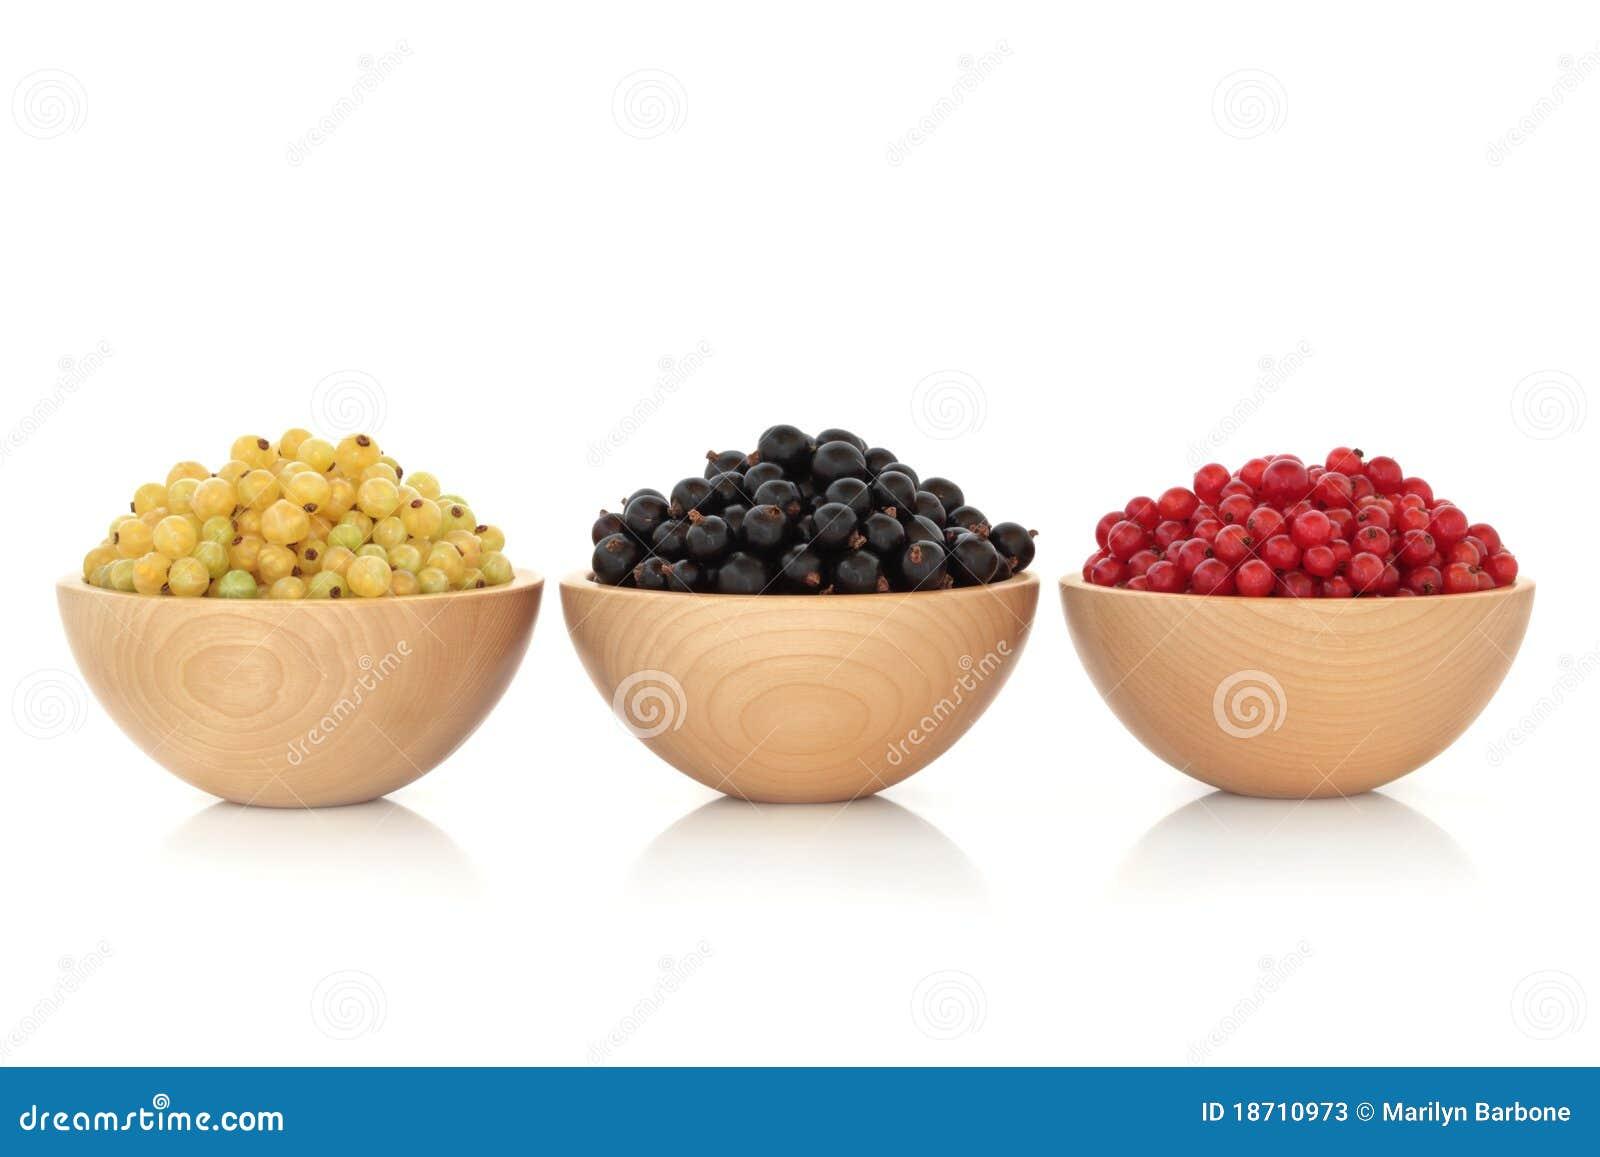 Redcurrant Blackcurrant and Whitecurrant Fruit